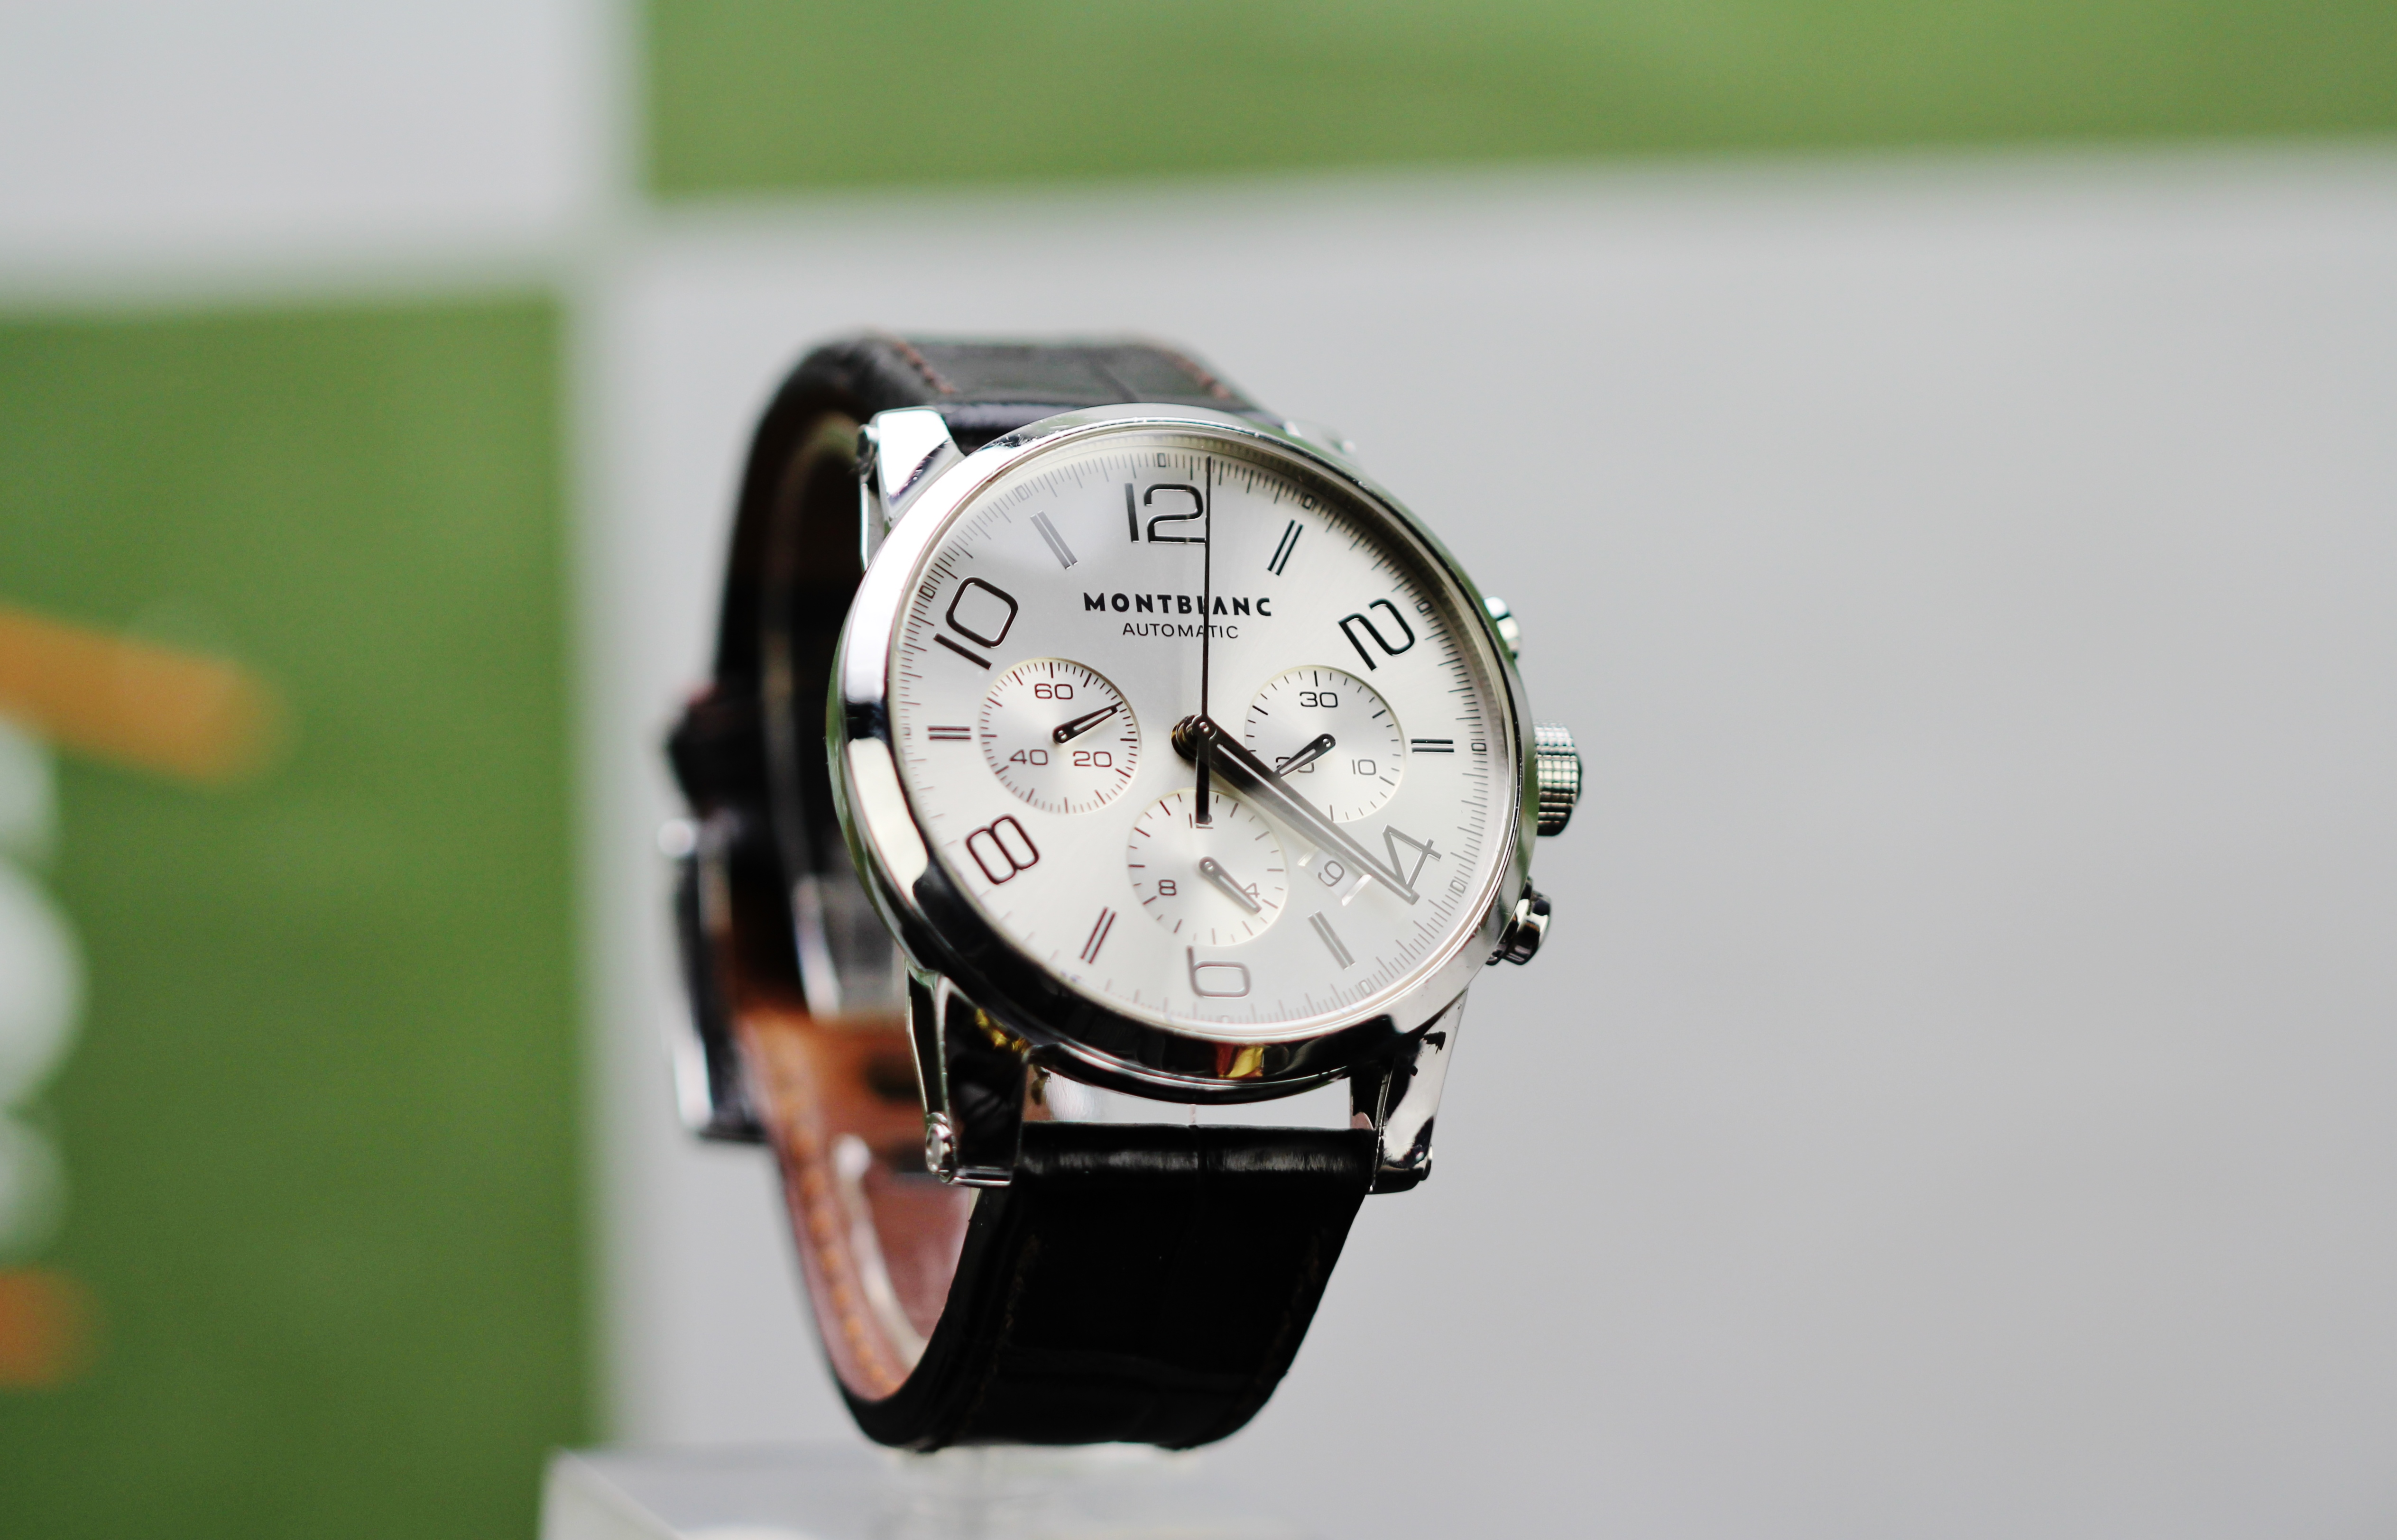 Lot 29 - Montblanc Timewalker Ref 7069 Chronograph